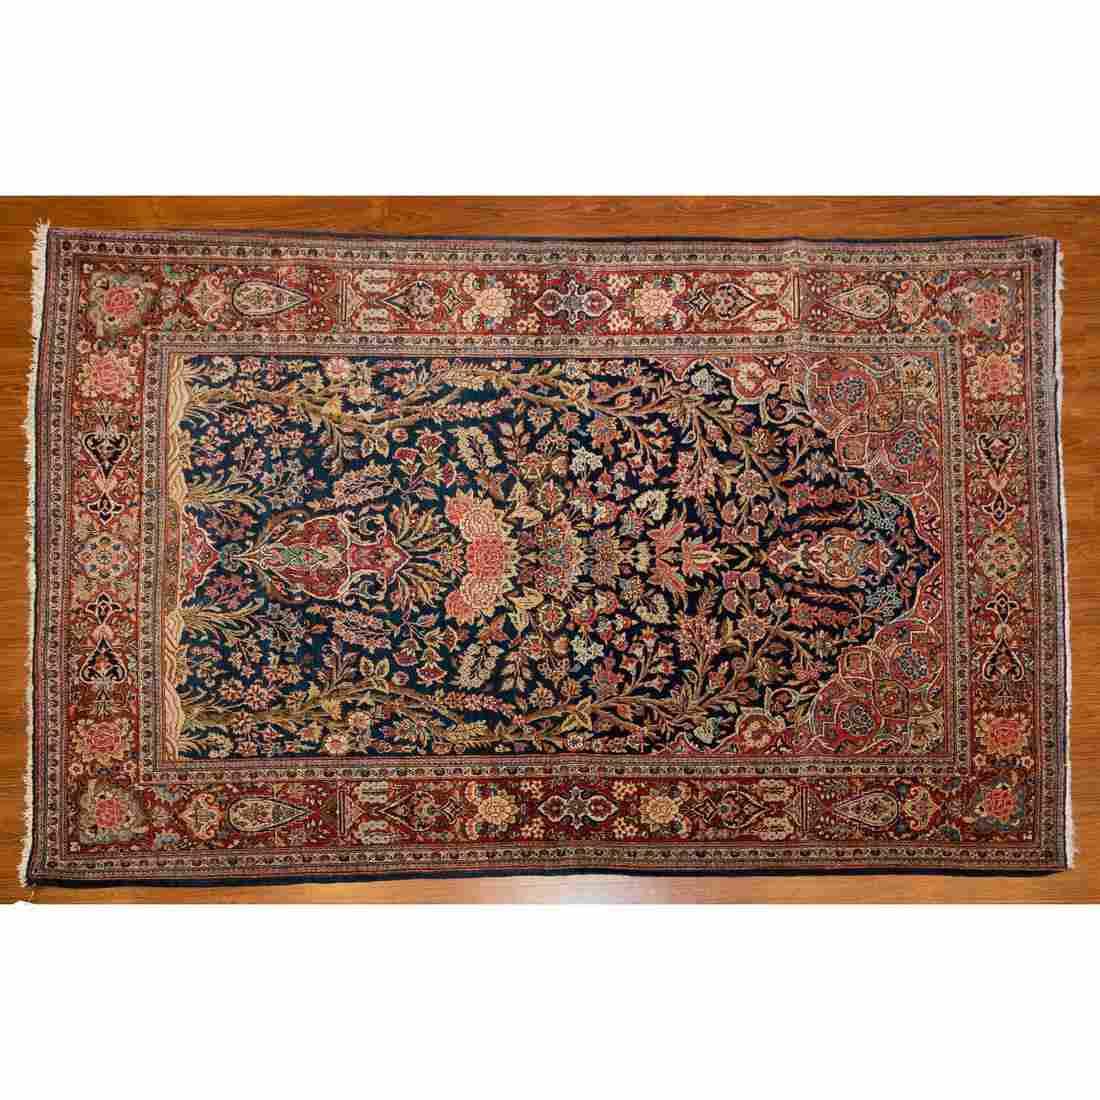 Semi-Antique Kashan Rug, Persia, 4.3 x 6.6